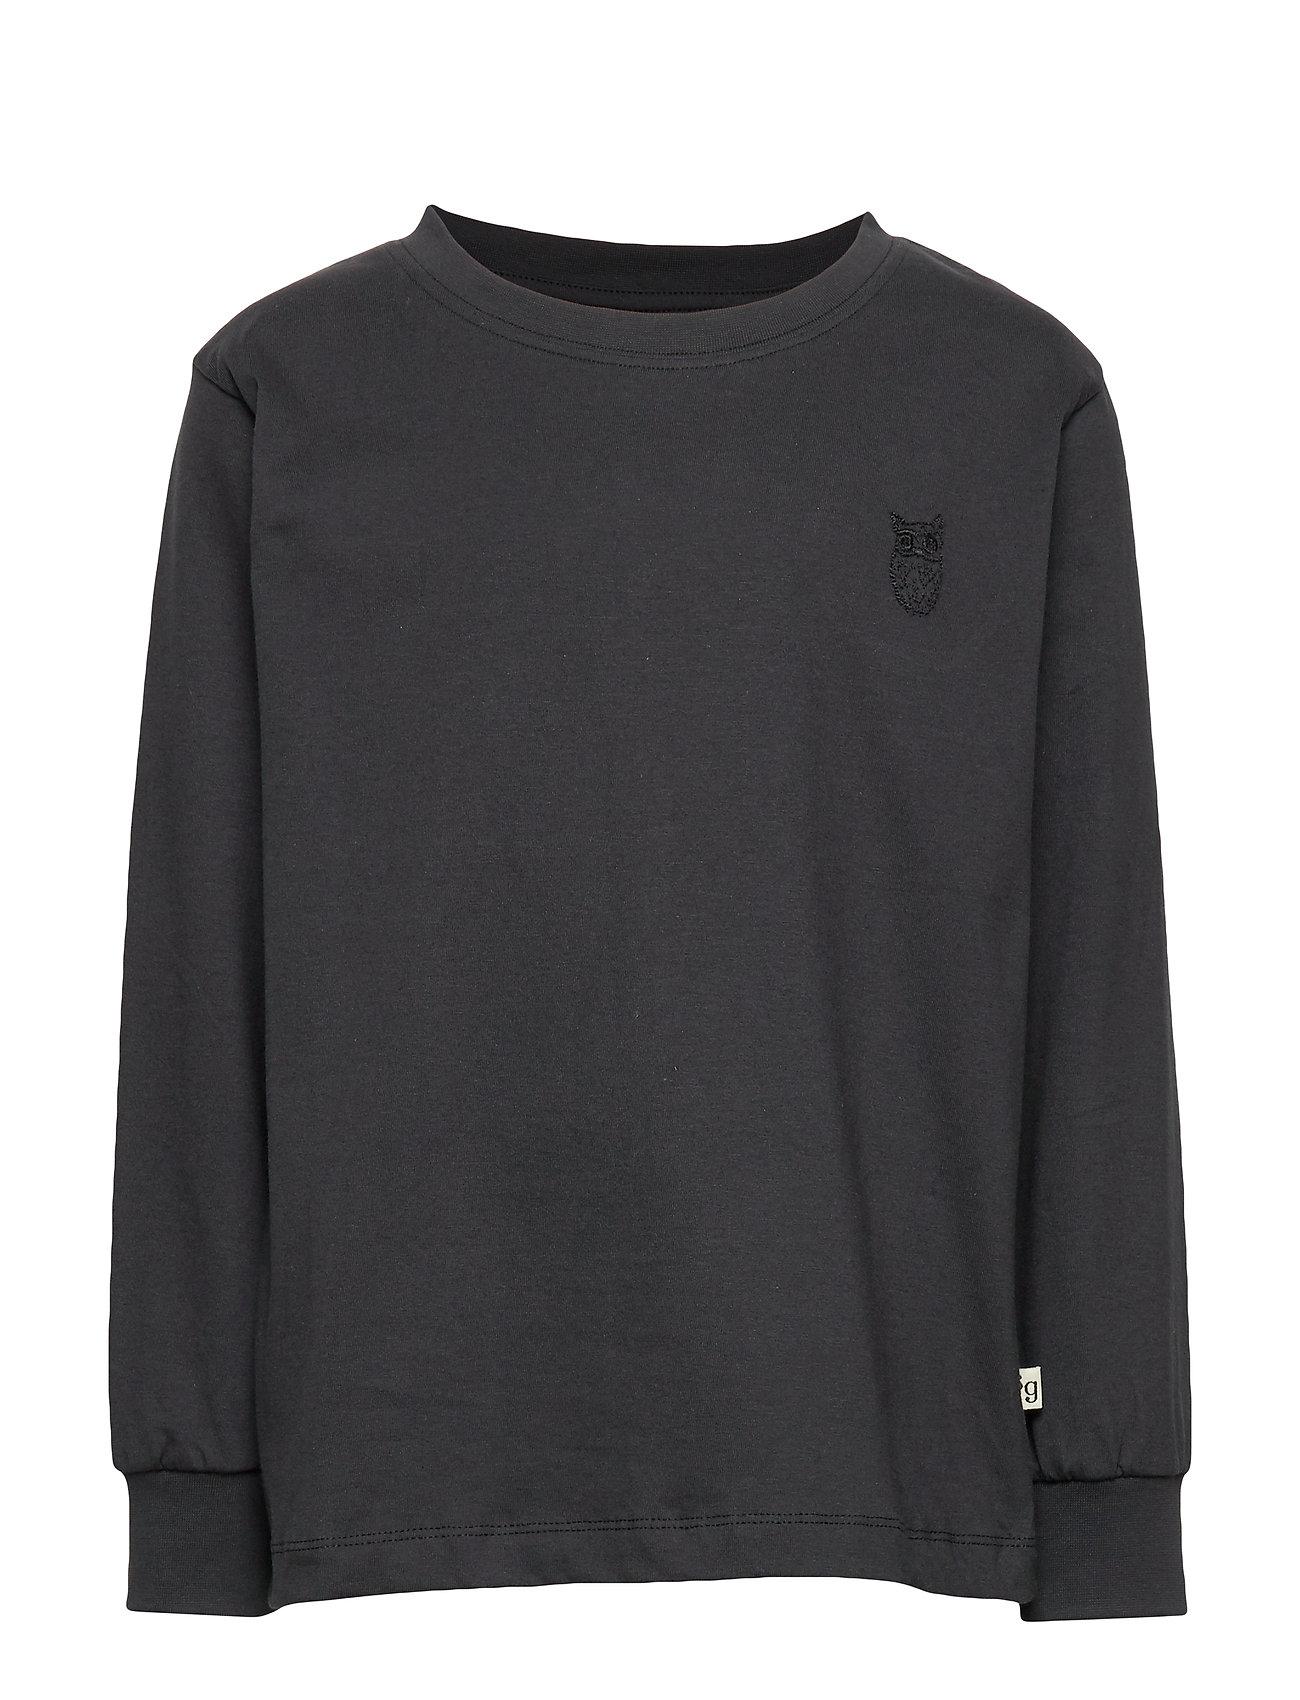 Soft Gallery Benson T-shirt - PHANTOM, MINI OWL EMB.